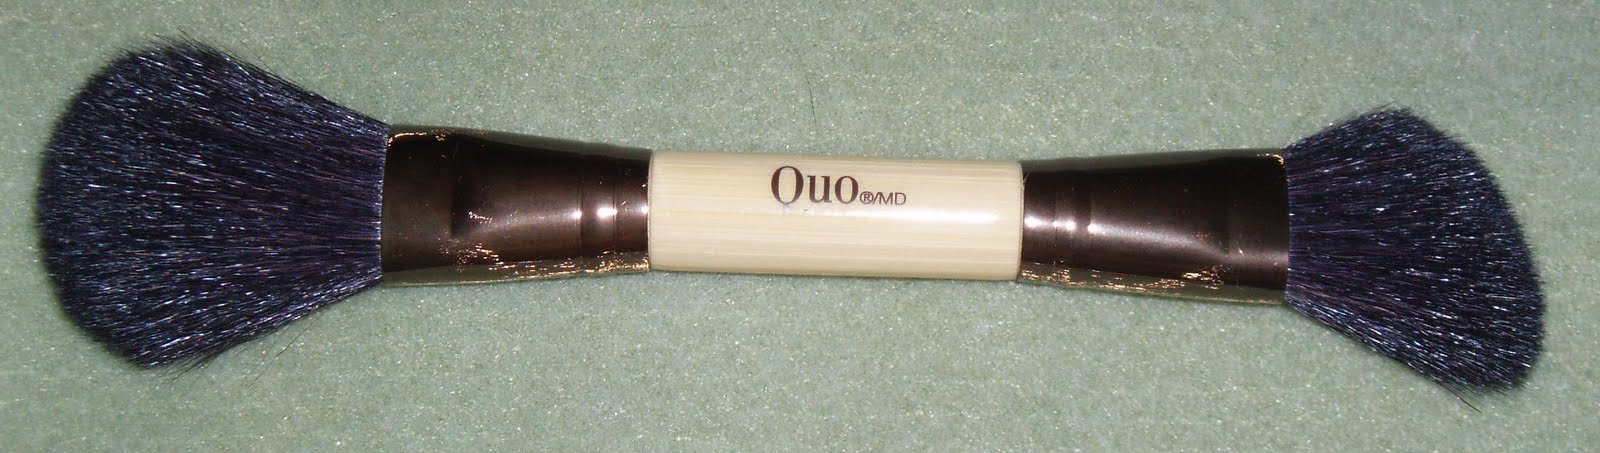 Quo makeup foundation